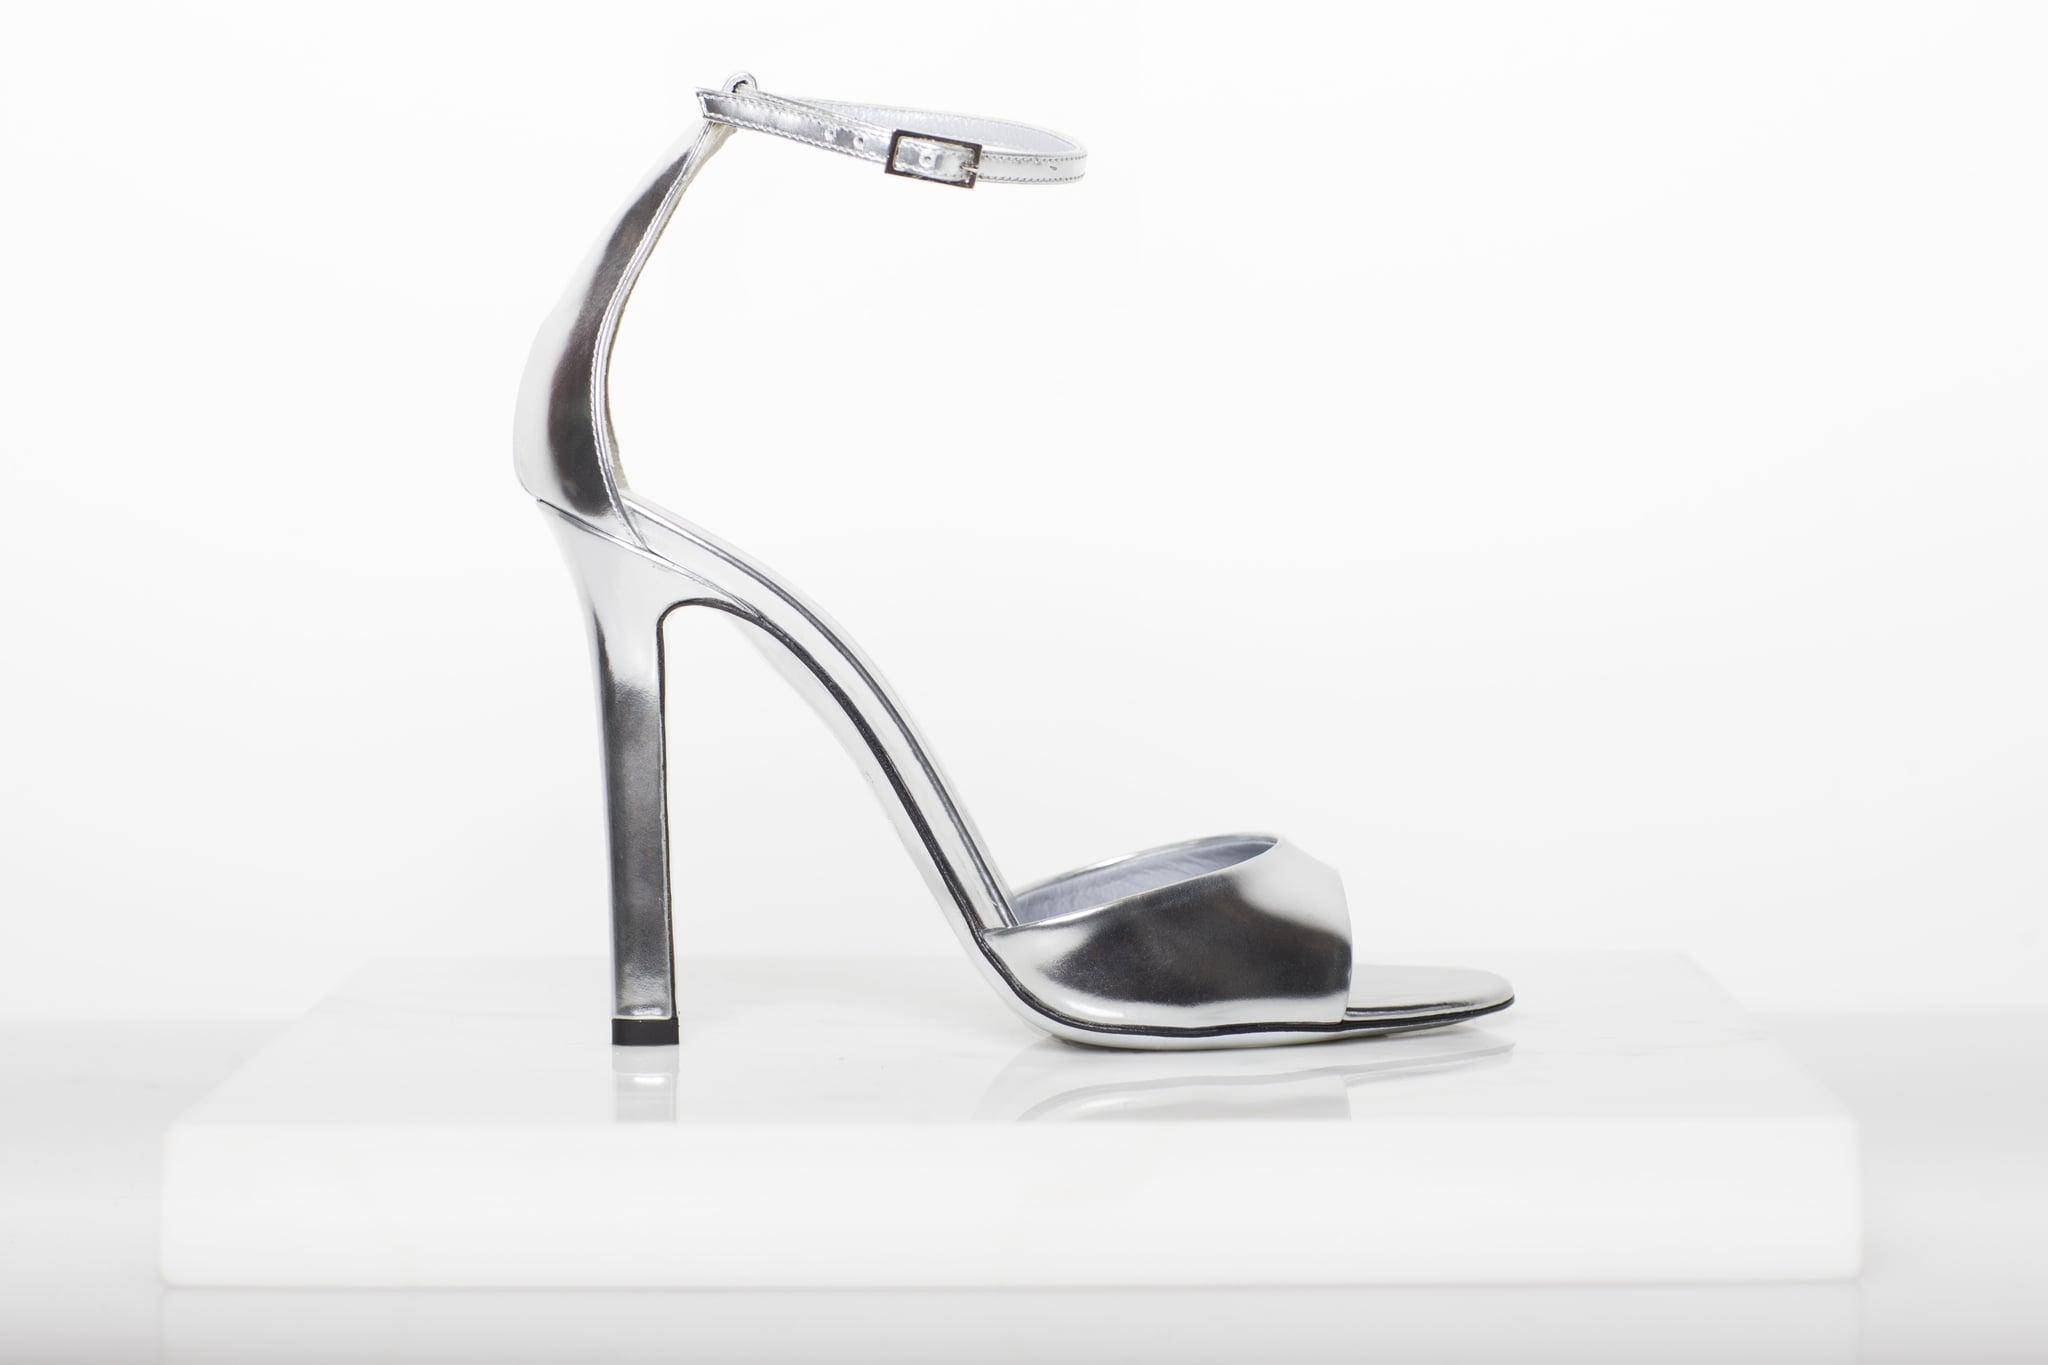 Whisper Sandal in Specchio ($650) Photo courtesy of Tamara Mellon